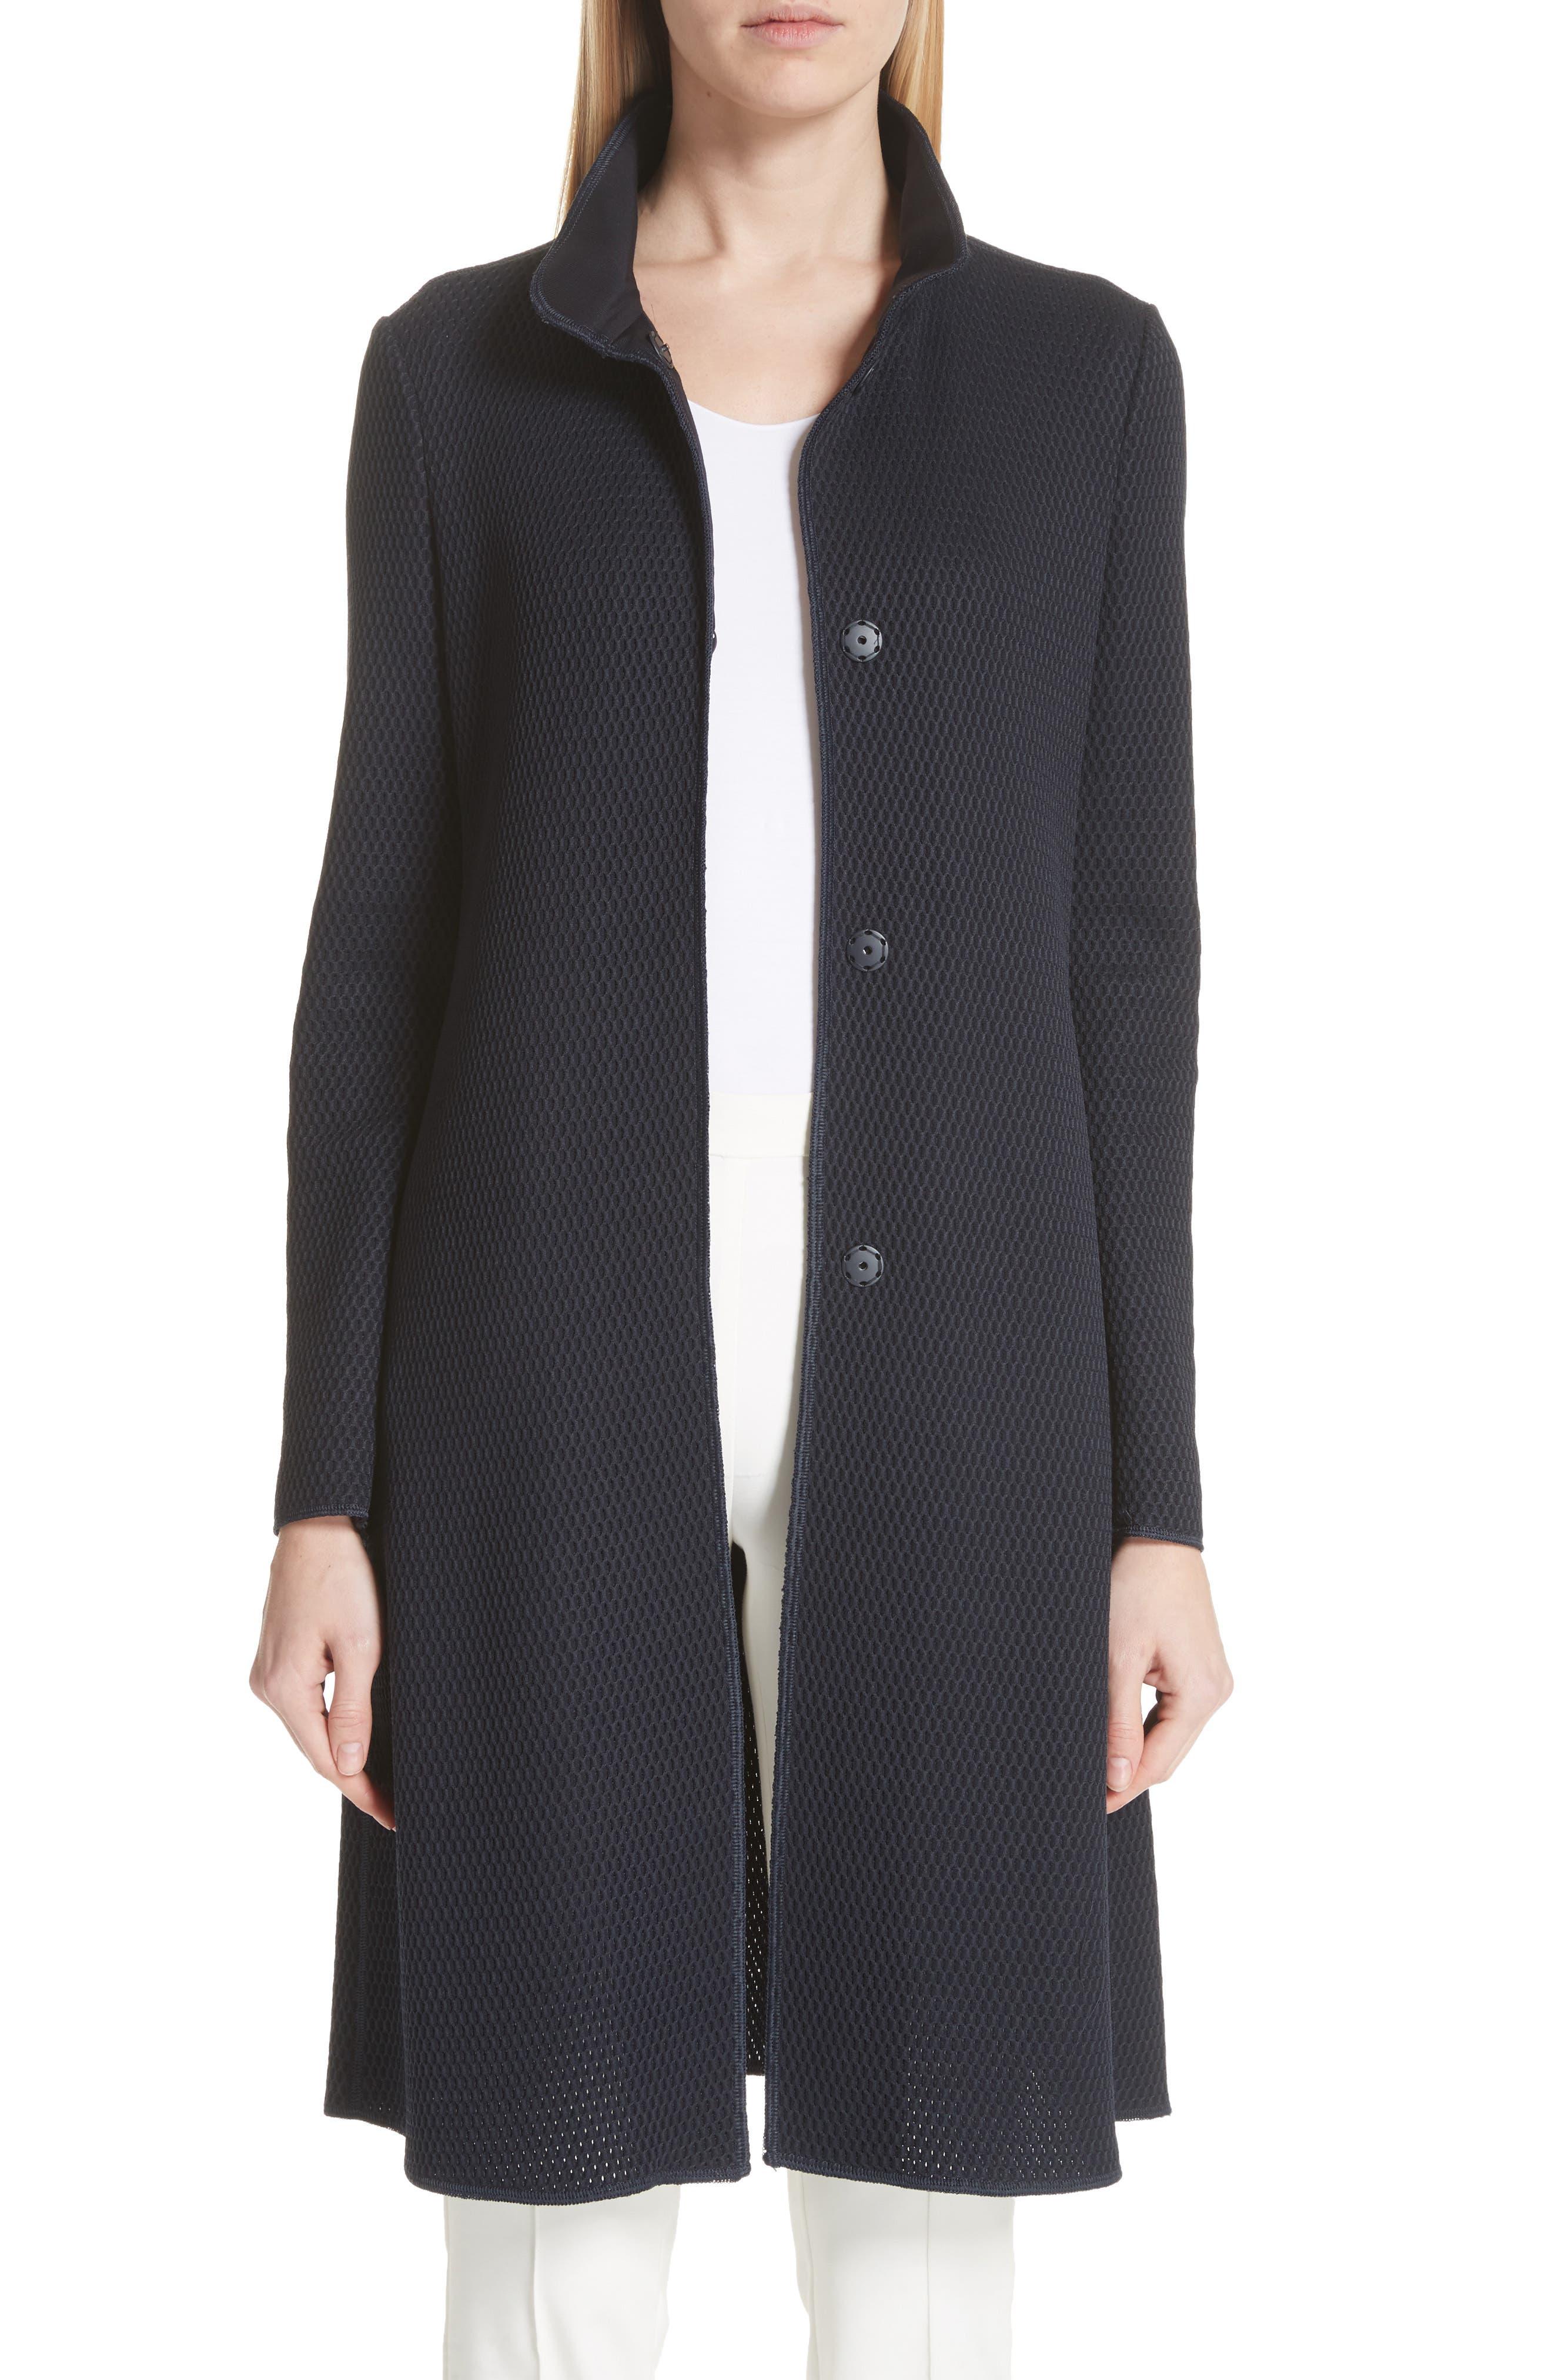 Honeycomb Knit Jersey Coat,                         Main,                         color, Navy